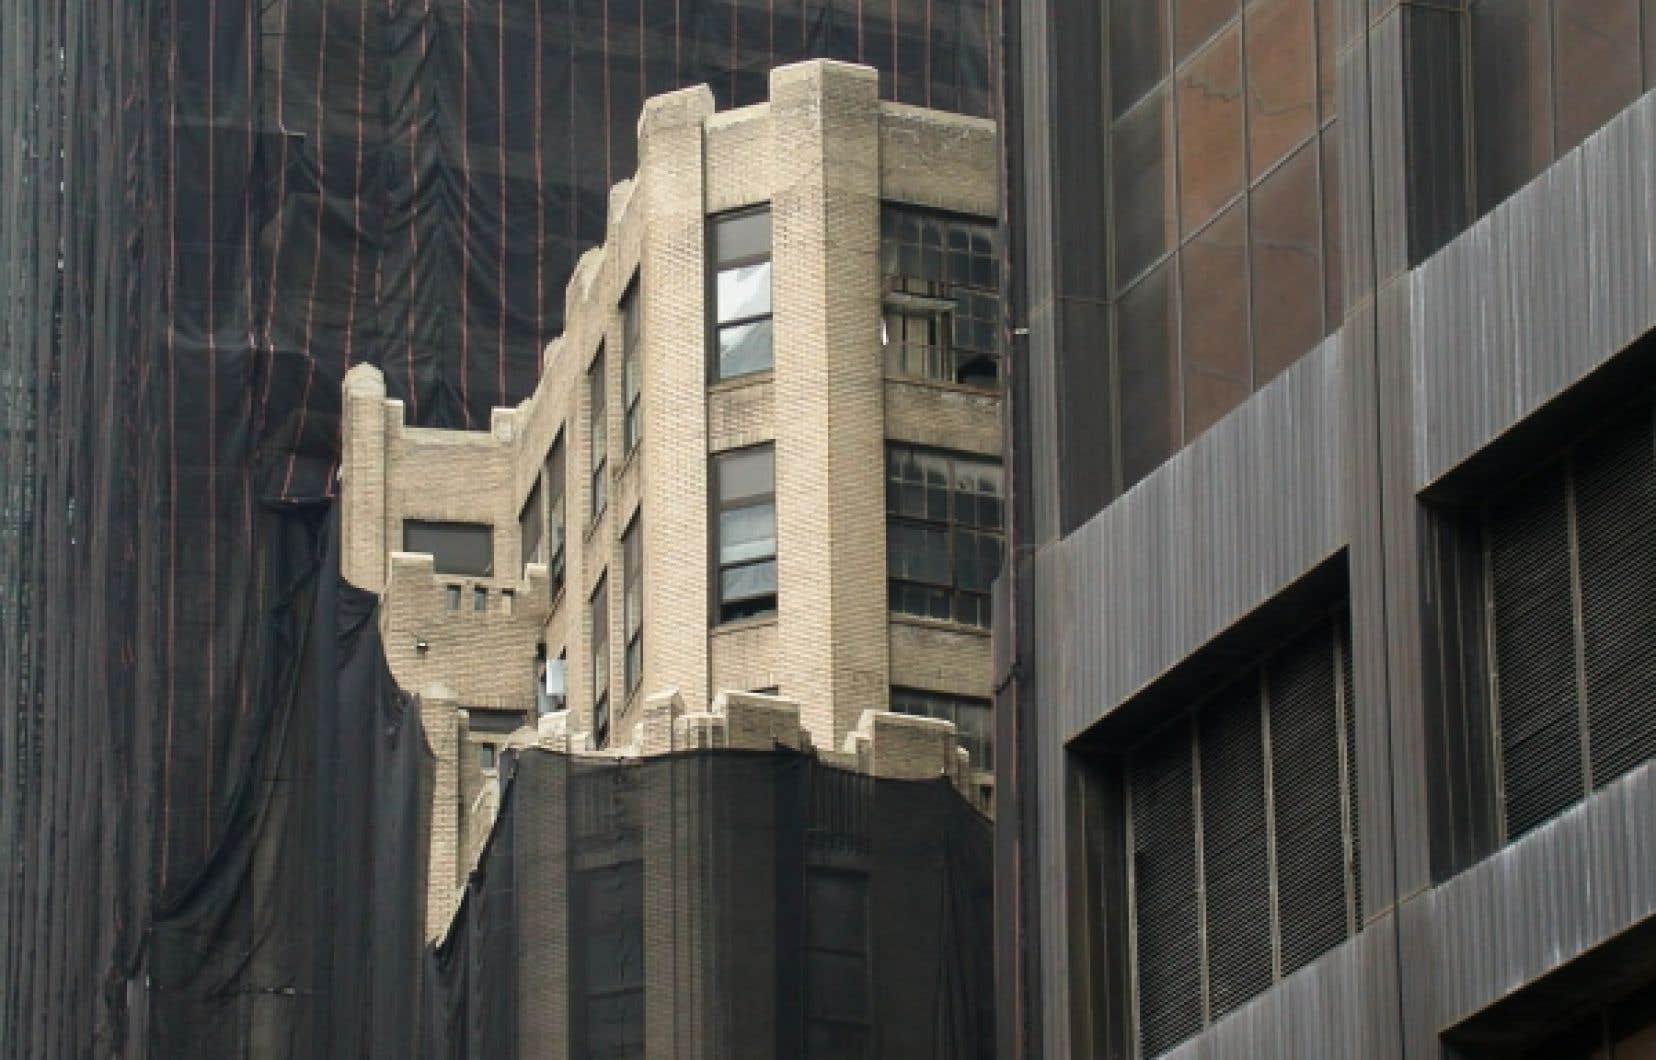 New York Ground Zero (2002). Photographie numérique.